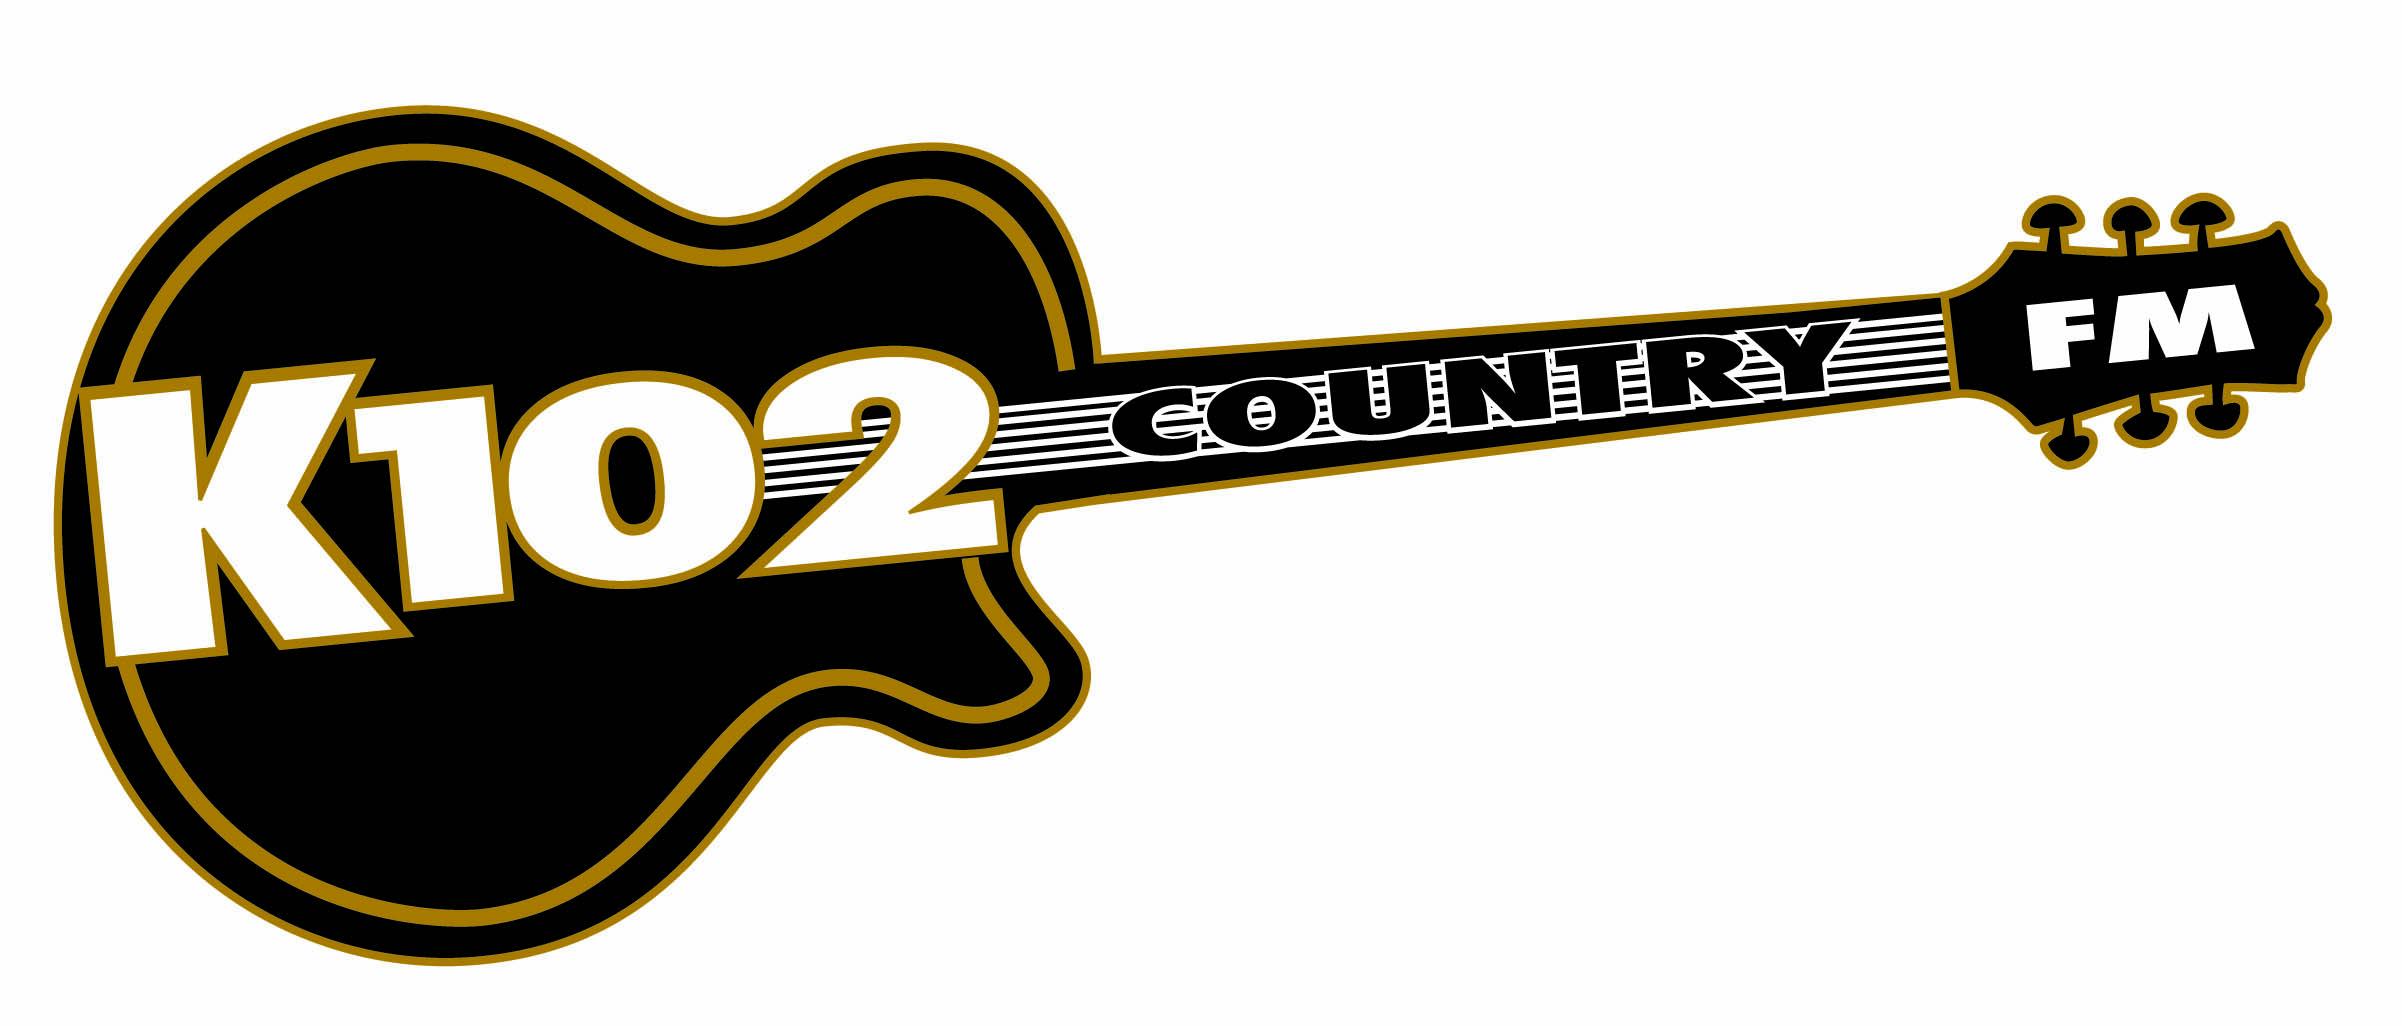 K102 Country logo